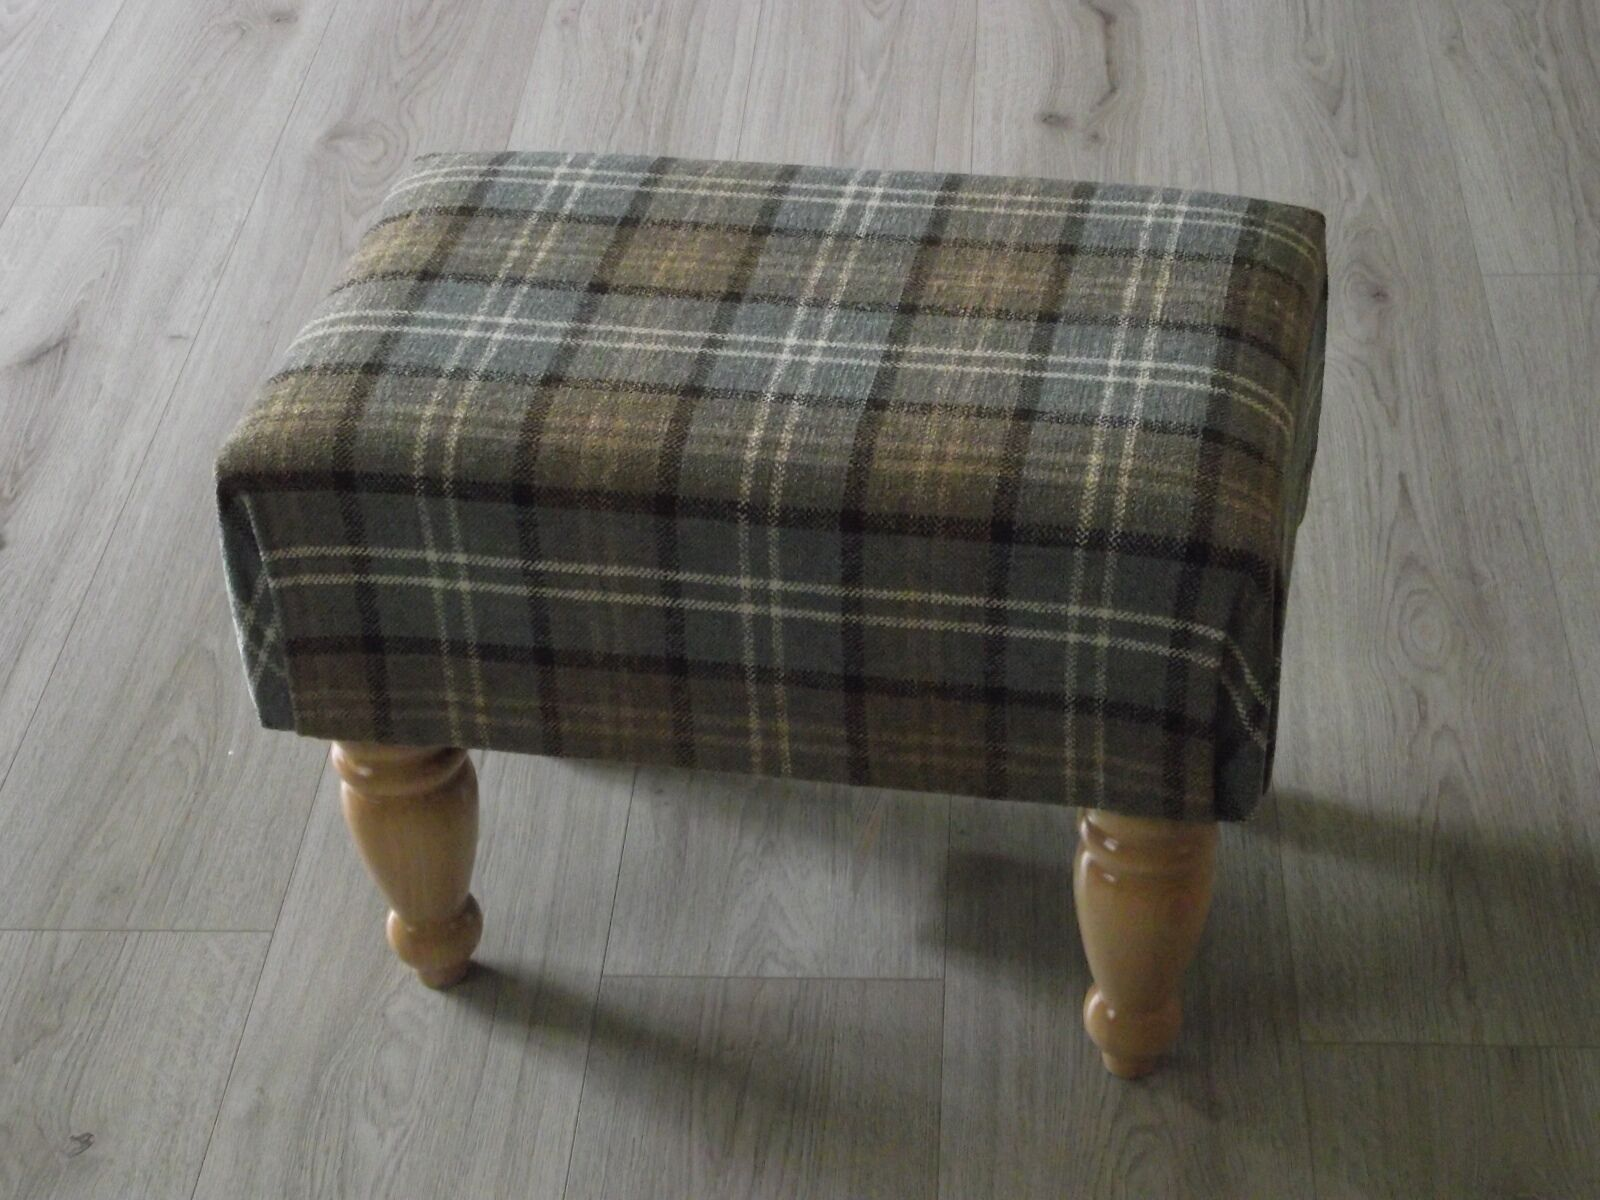 New Large Lana Tartan box style footstool light wood turned leg upholsterot top